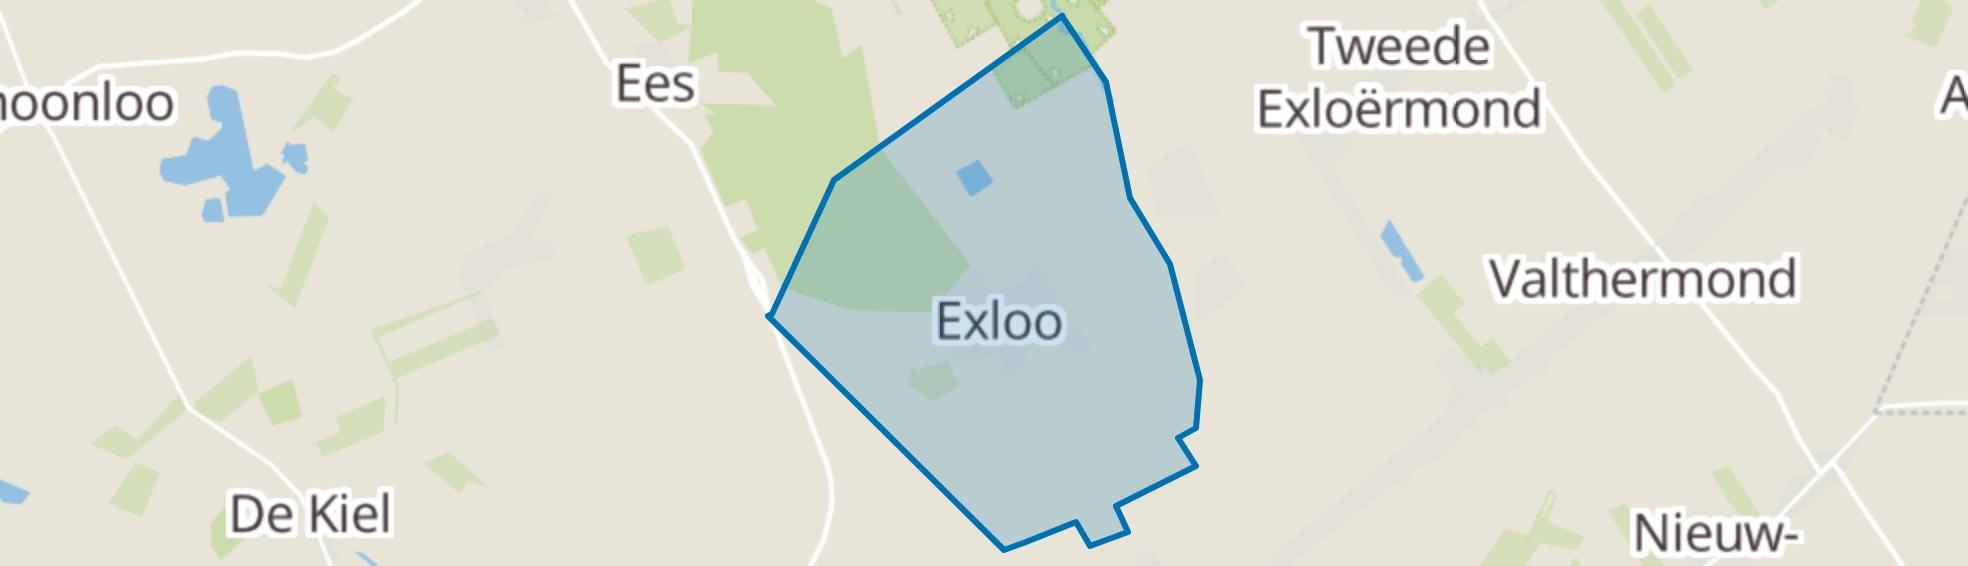 Exloo map